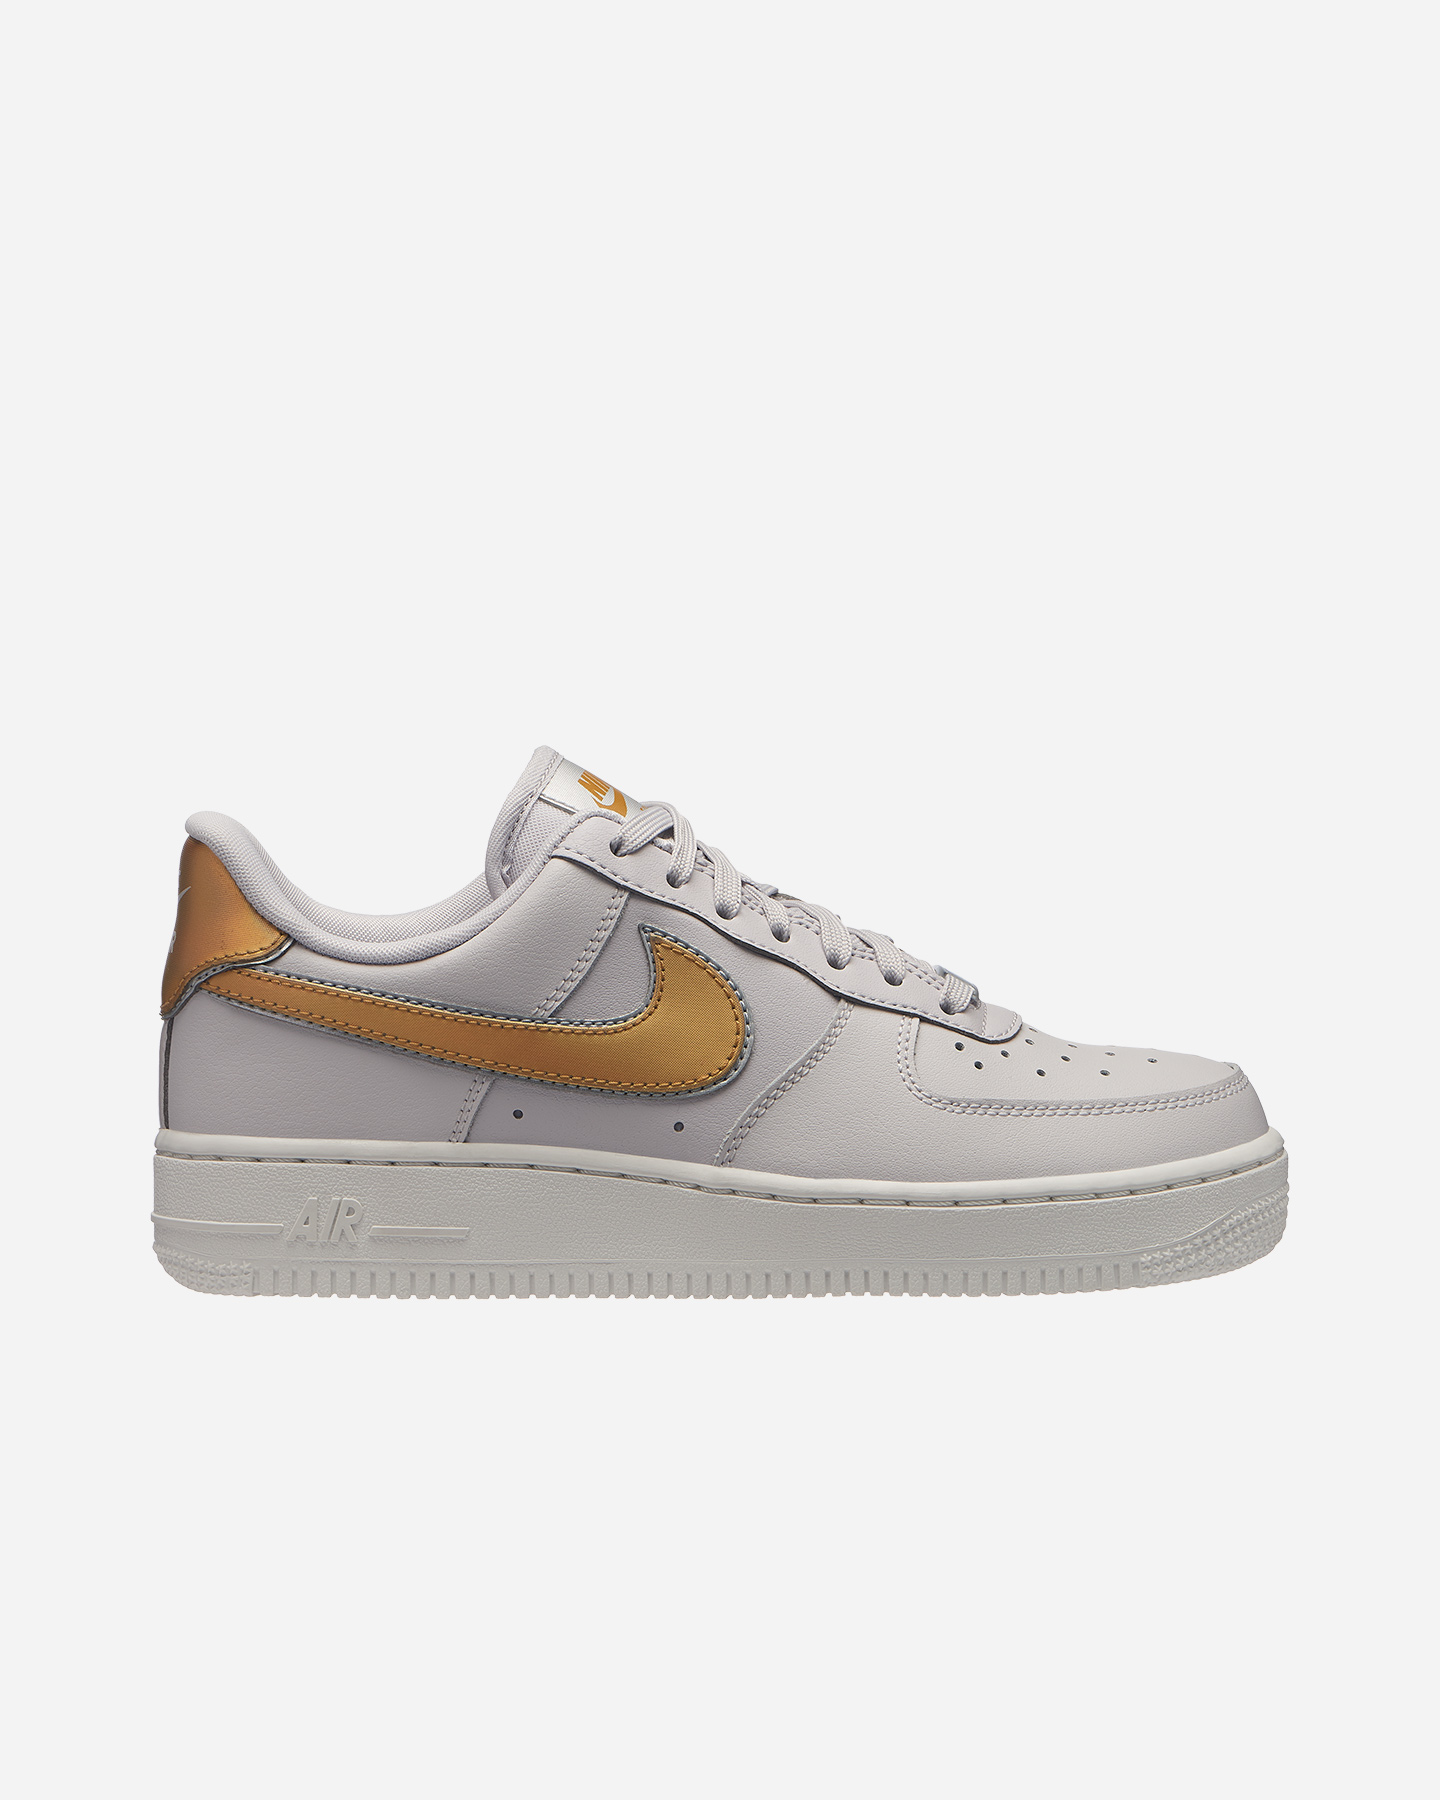 '07 Su Force 1 W Nike Scarpe Sneakers Metallic Air Ar0642 001 4wvSxFqt